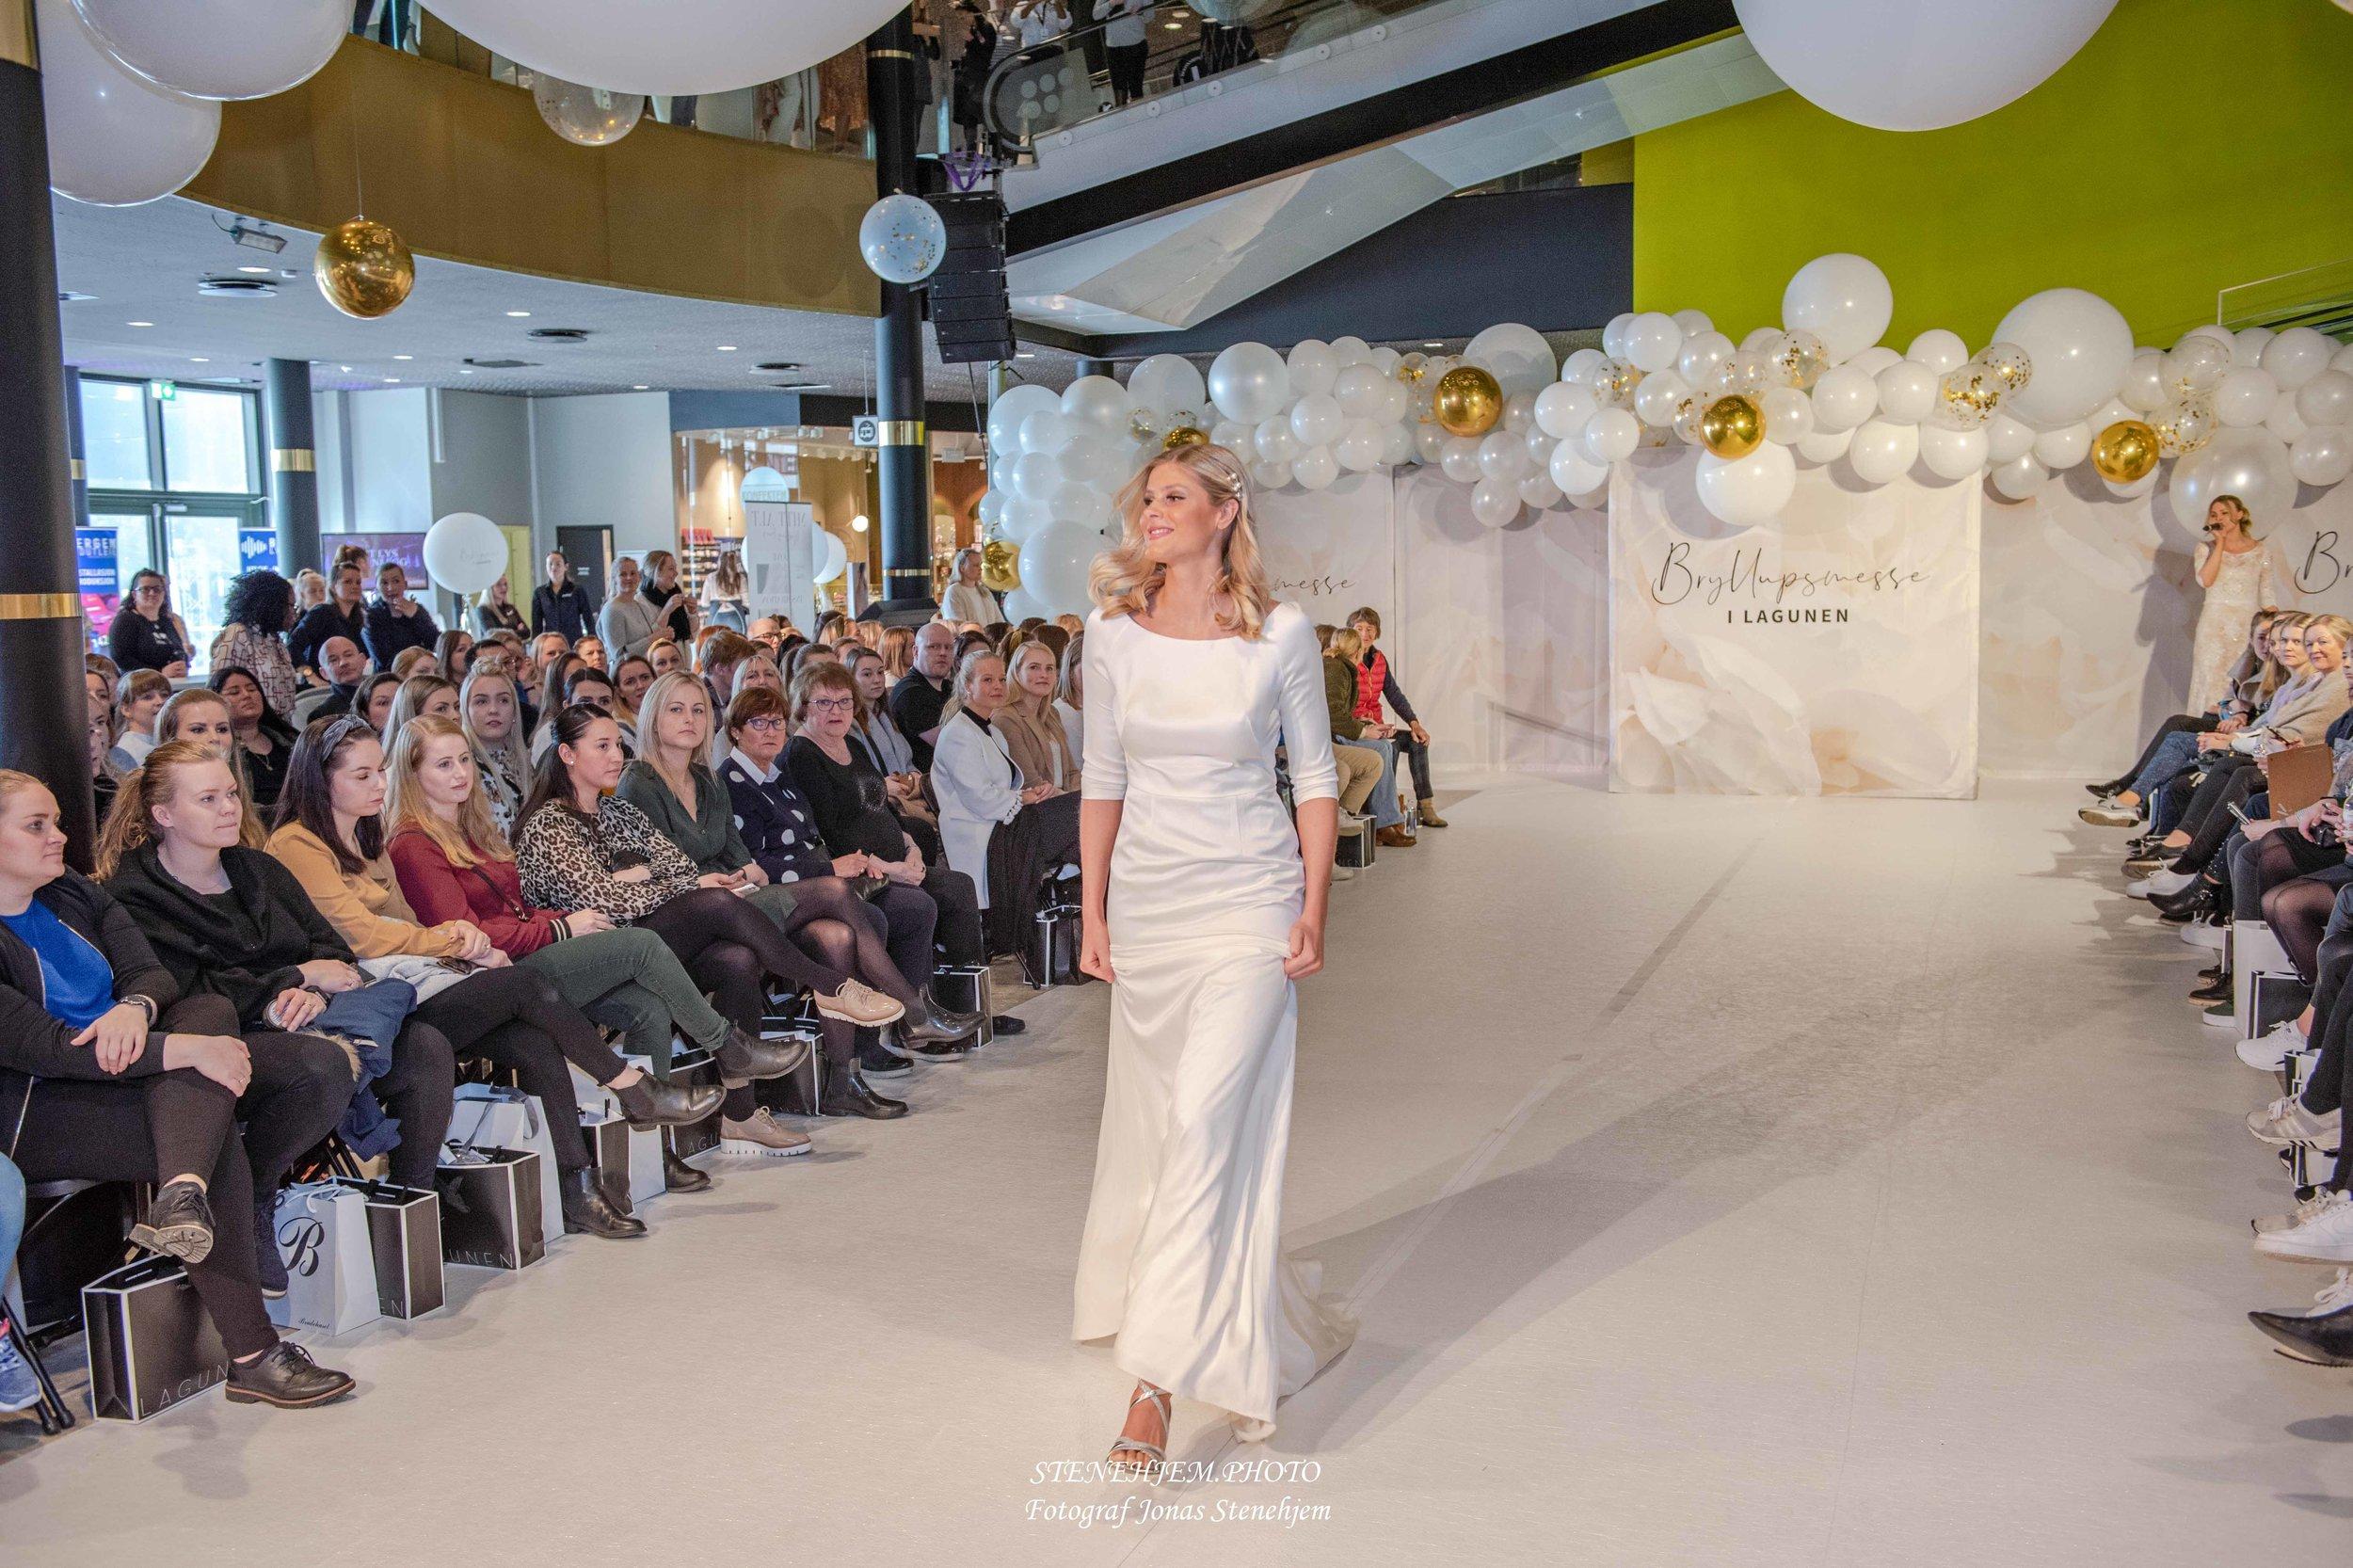 Bryllupsmesse_Lagunen_mittaltweddingfair__026.jpg